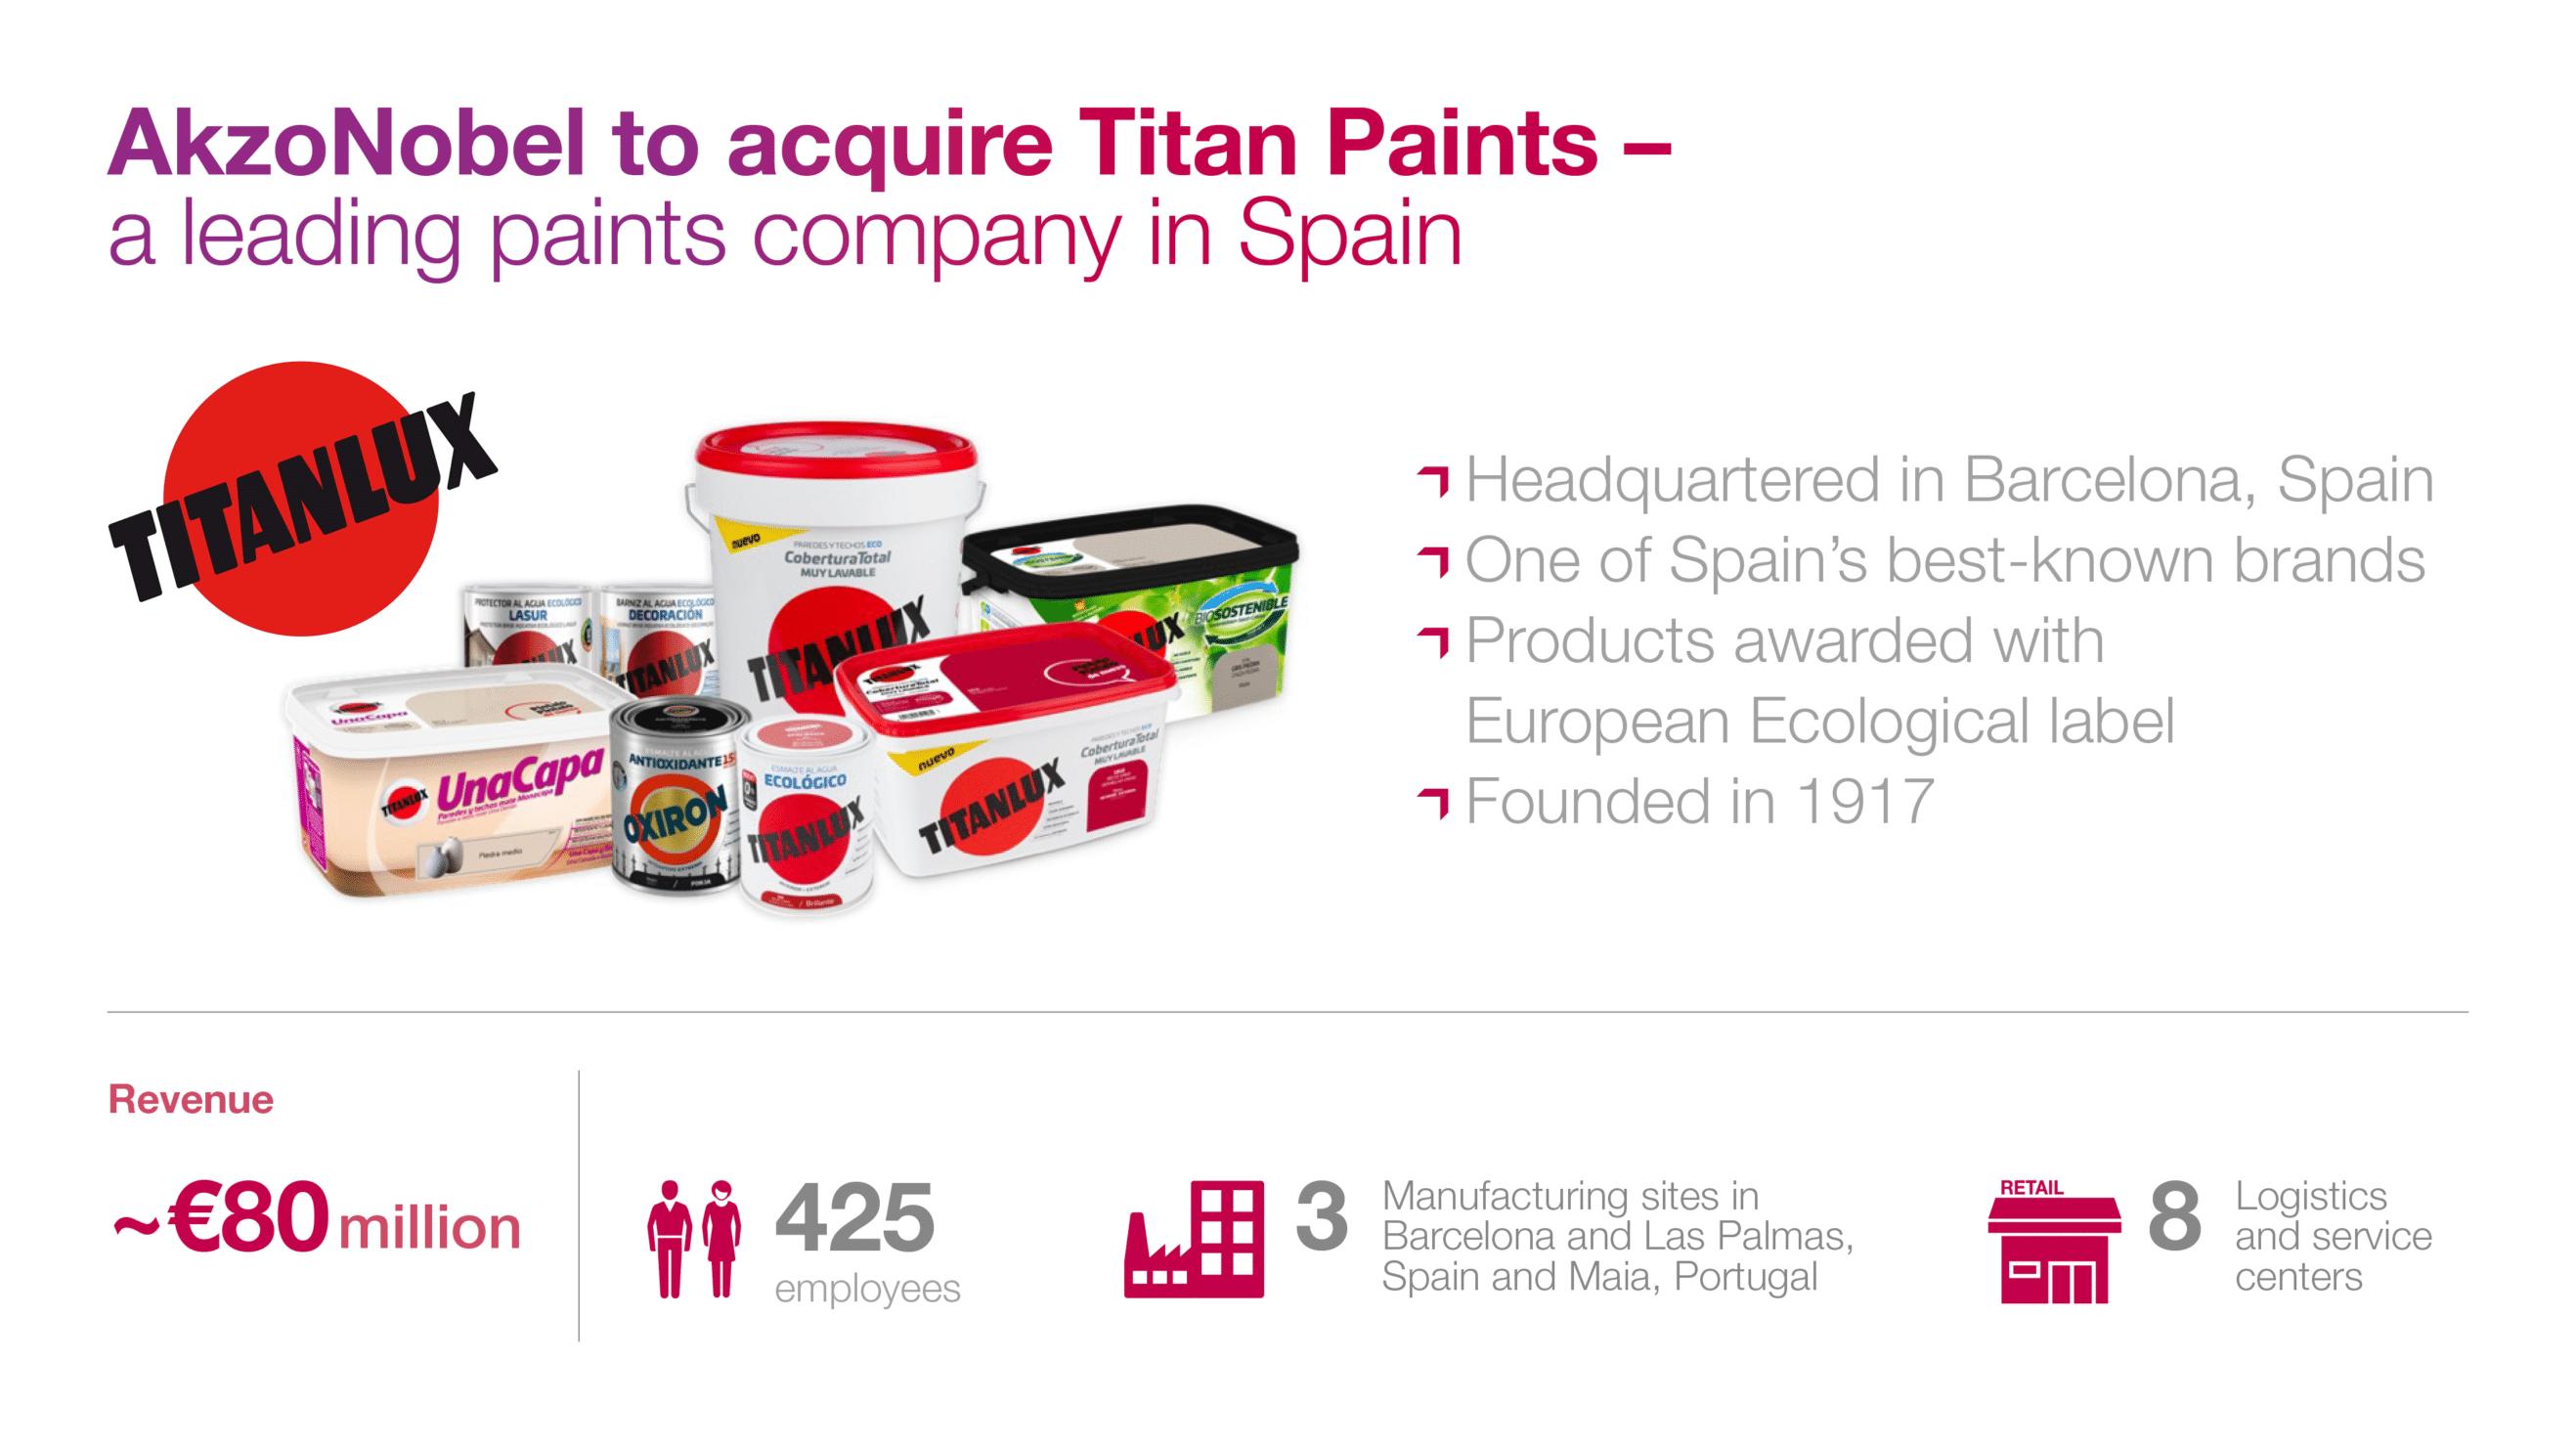 infographic of akzonobel acquisition of titan